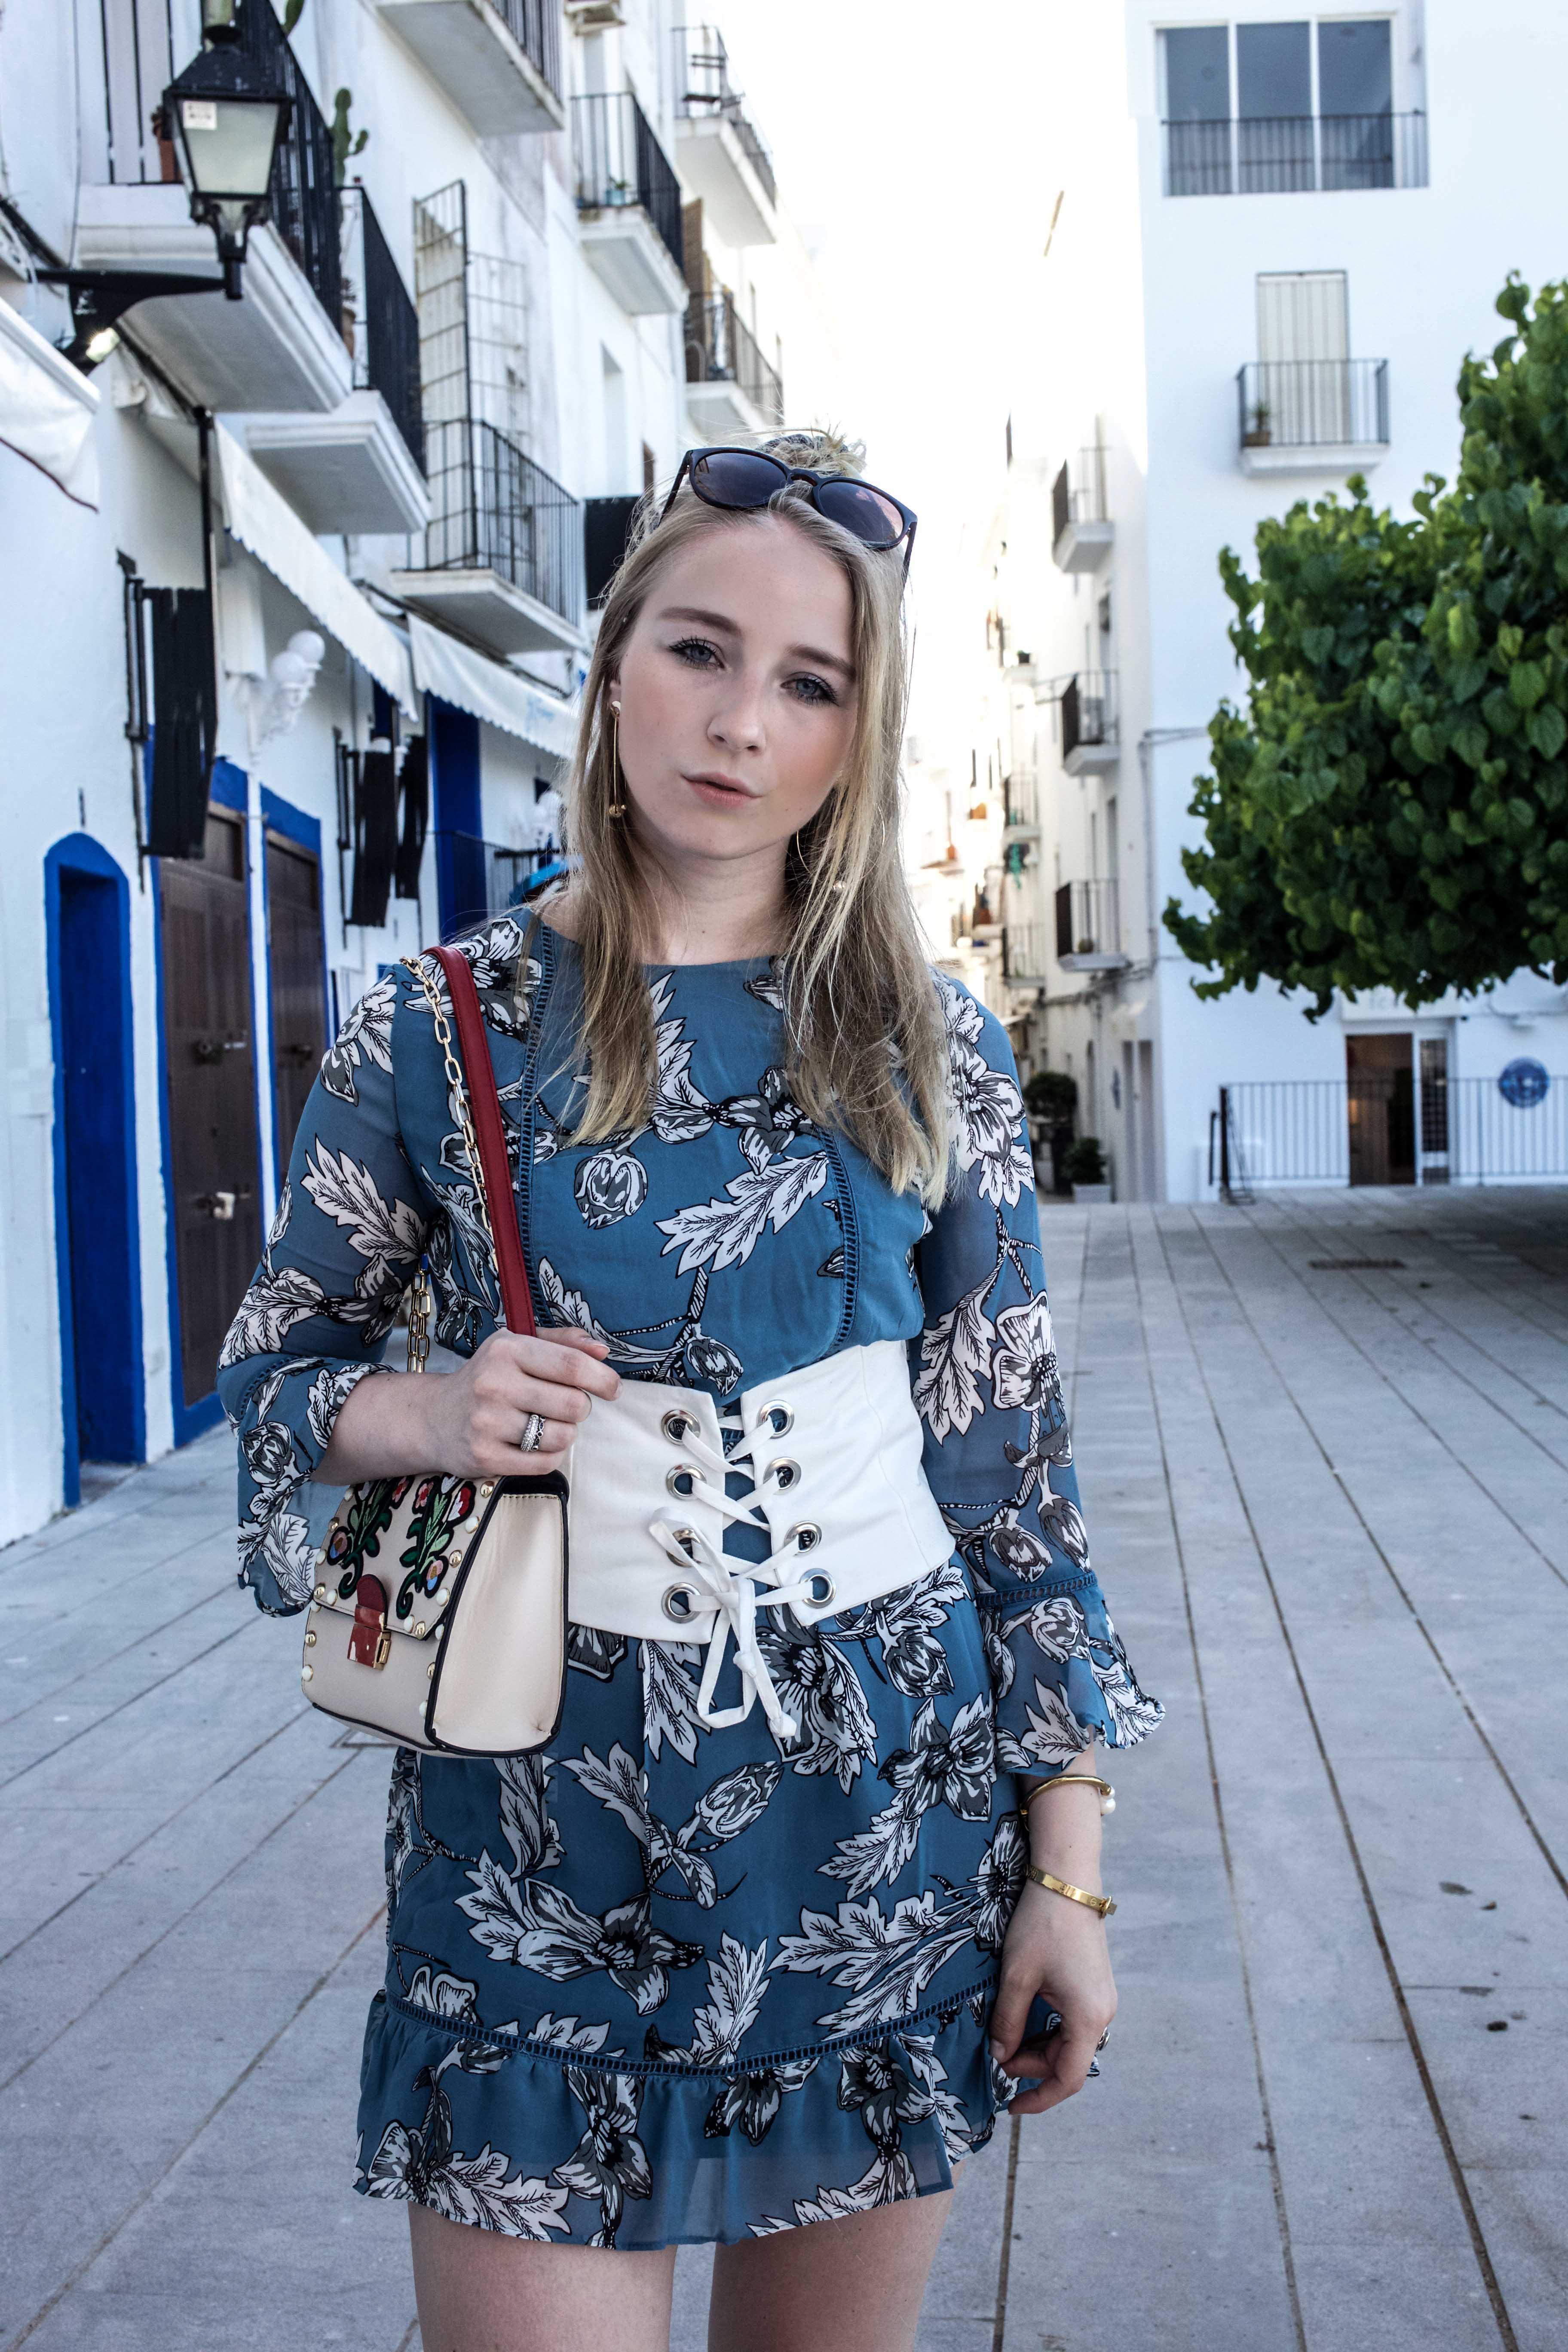 trend-report-taillengürtel-espadrilles-sommerlook-ibiza-modeblog-fashionblog-fashionvernissage_9548